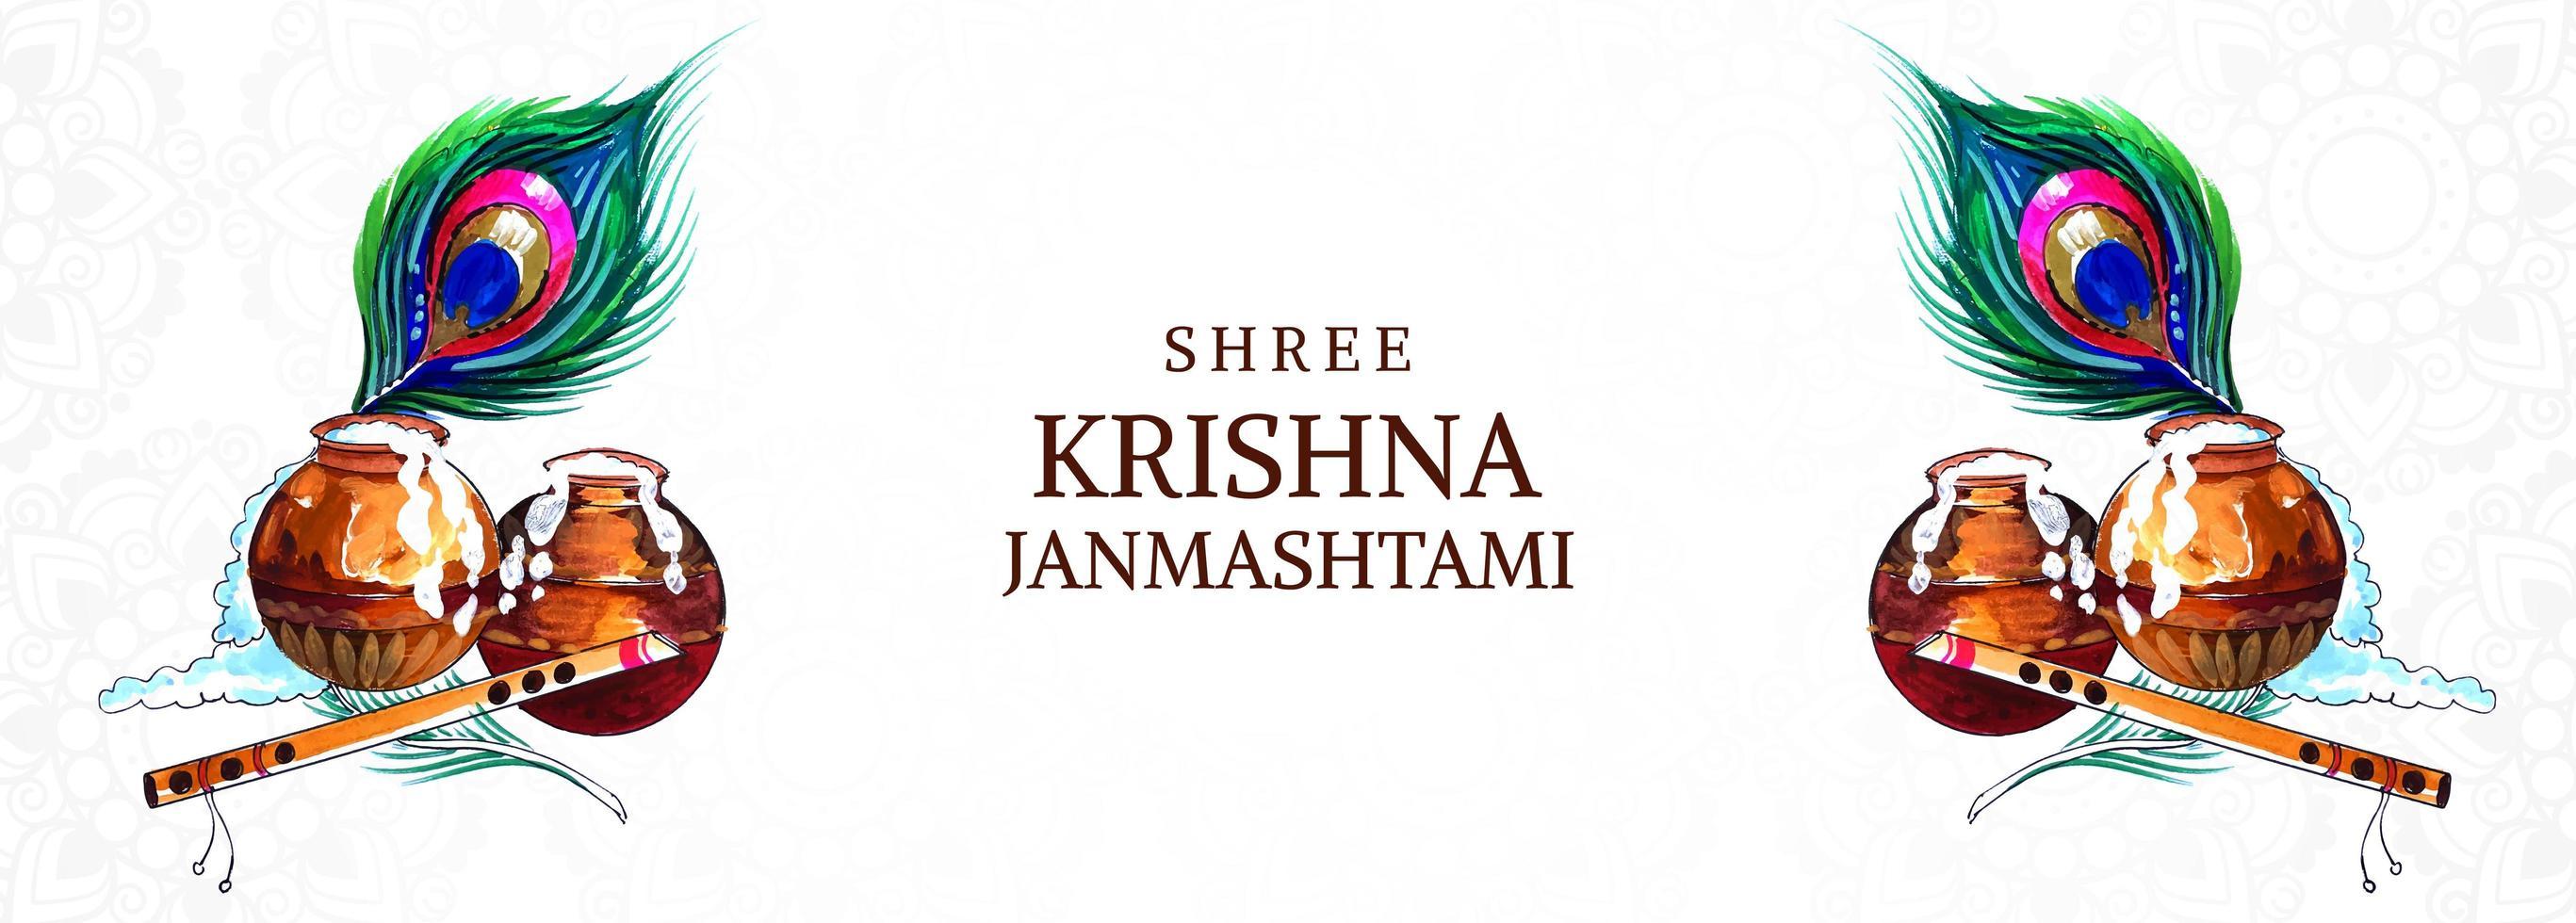 krishna janmashtami-banner met dahi handi-kaart vector